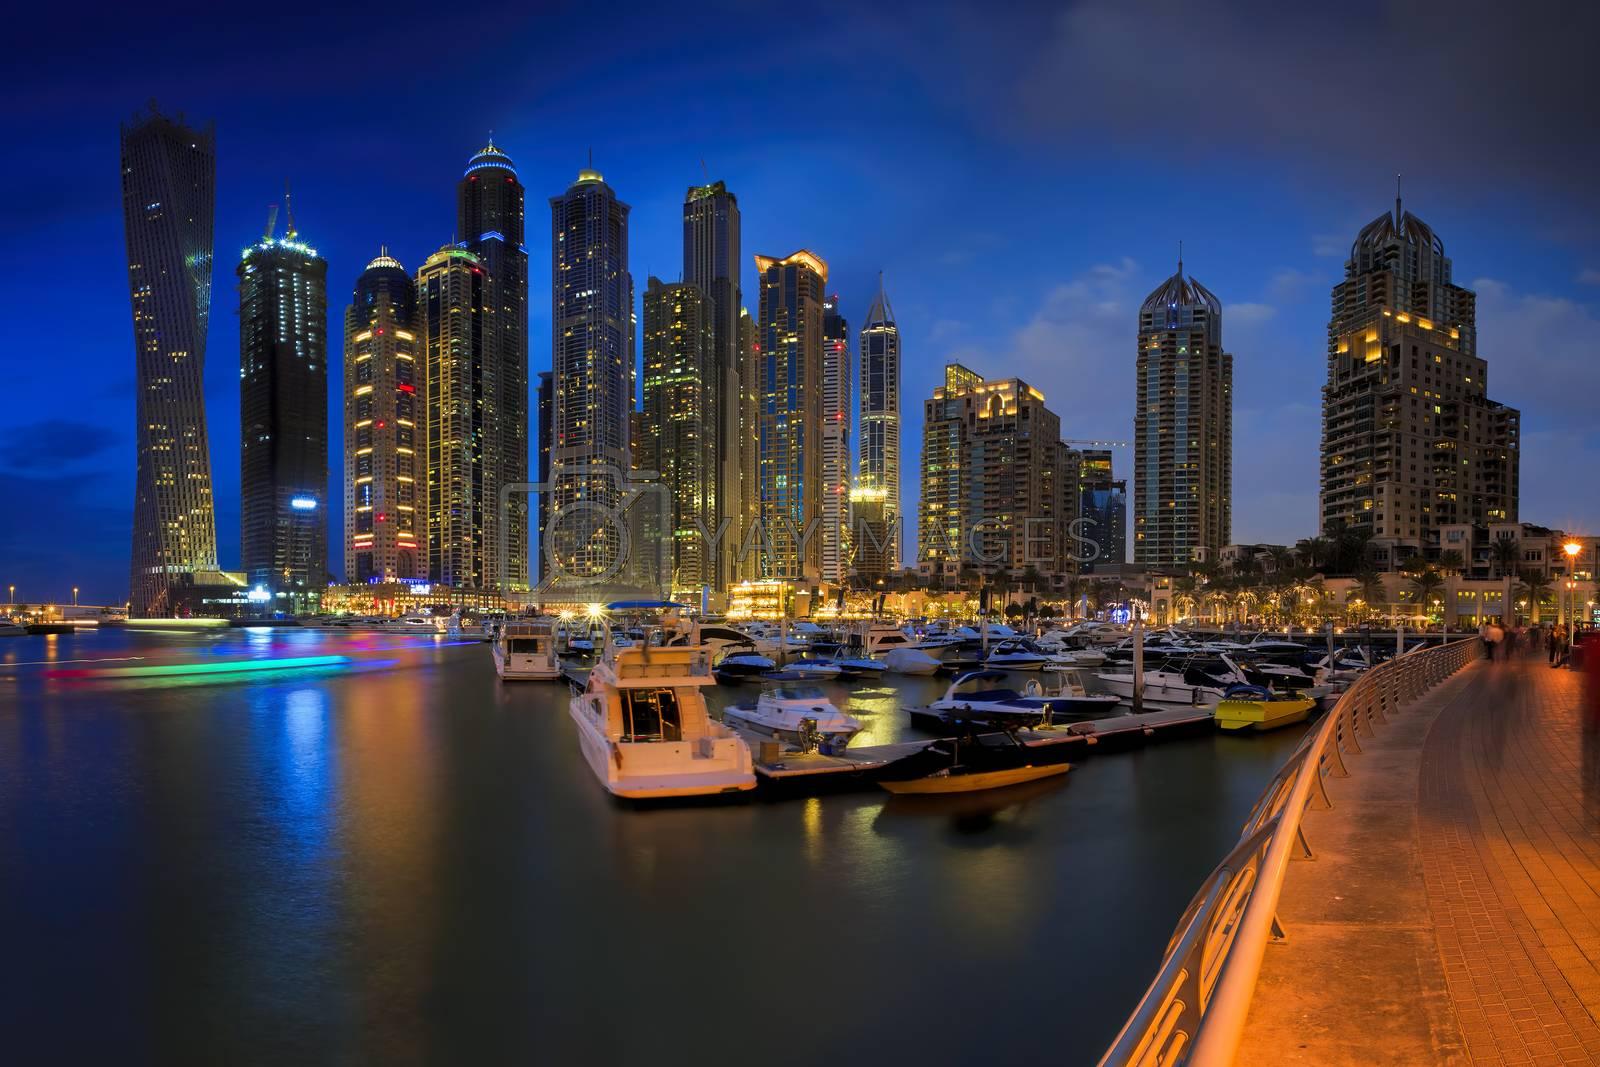 Skyline sunset picture shot at Dubai marina